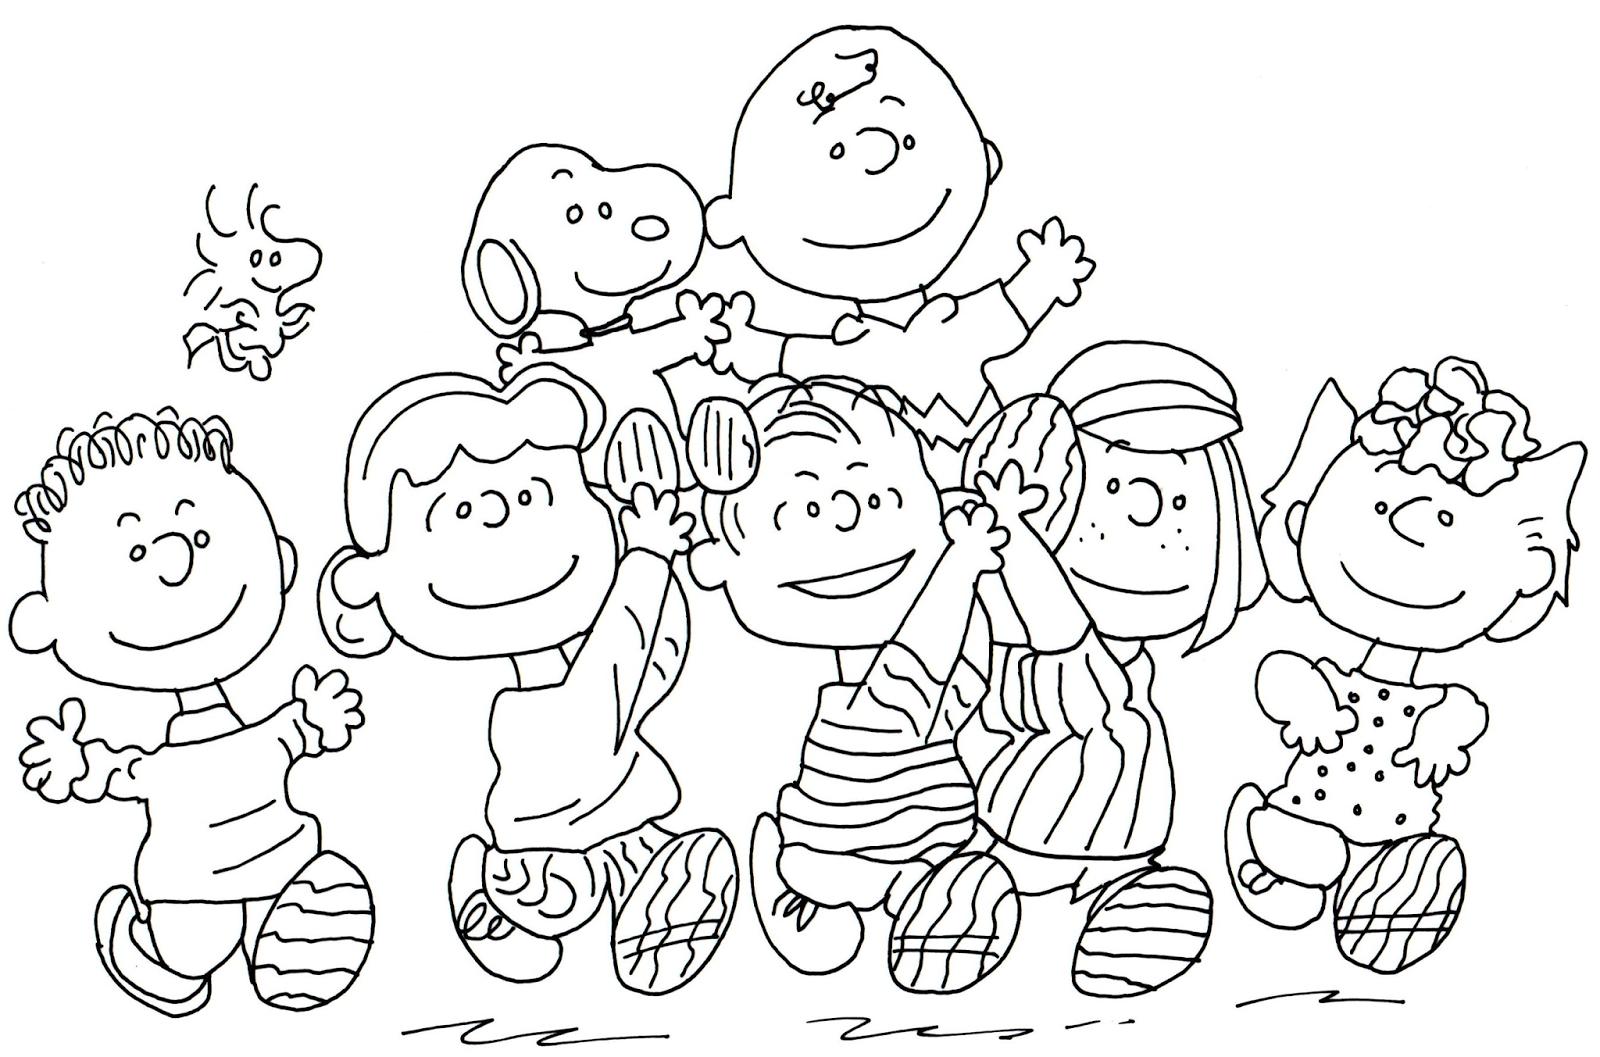 snoopy coloring pages coloring pages snoopy coloring pages free with snoopy halloween coloring pages